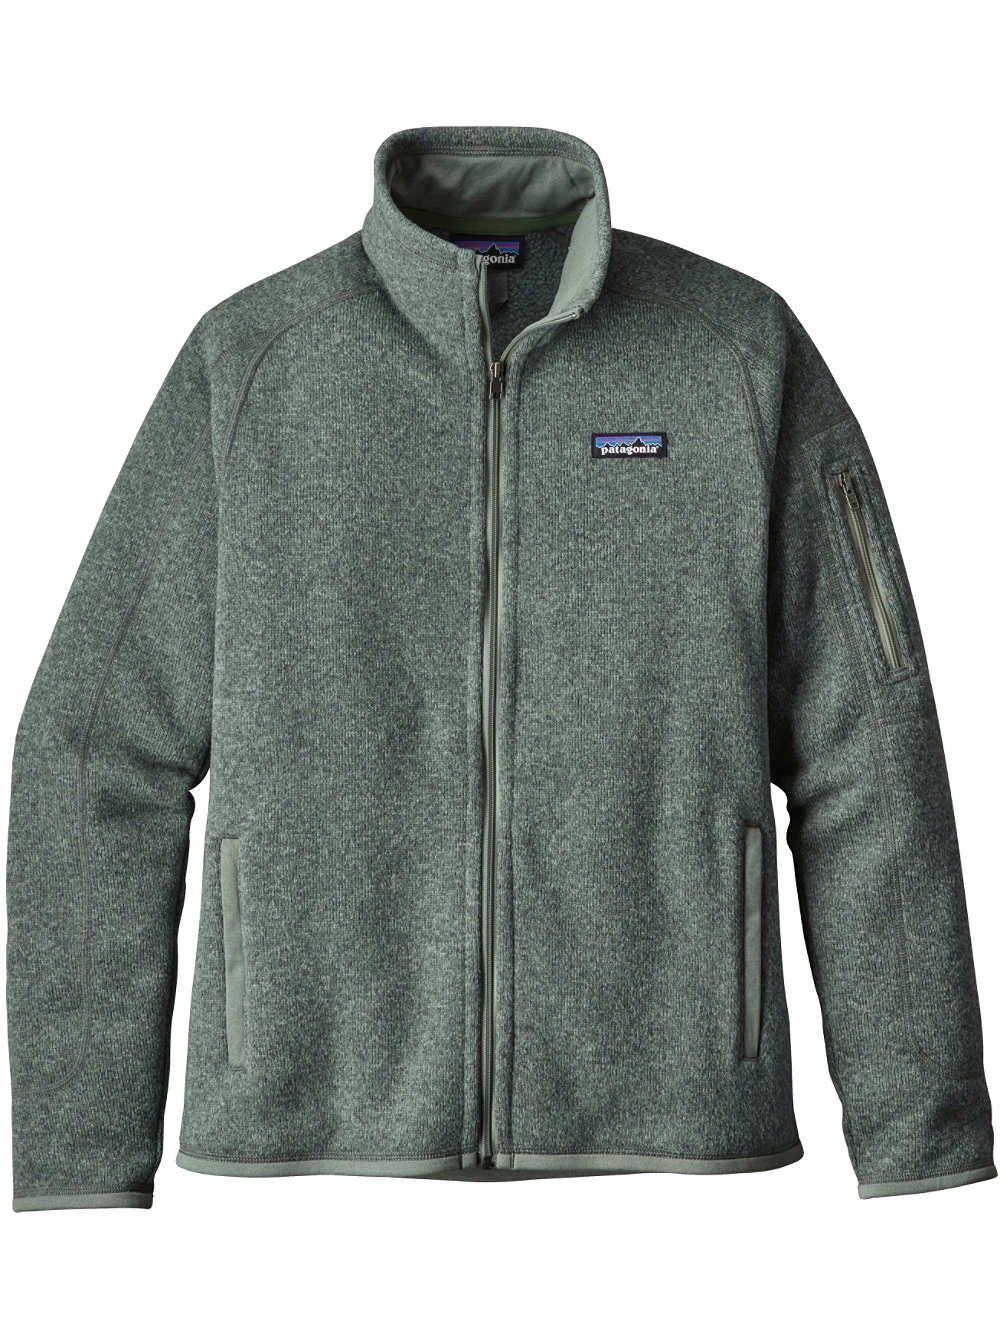 Patagonia Women Better Sweater Jacket - Hemlock Green (L)